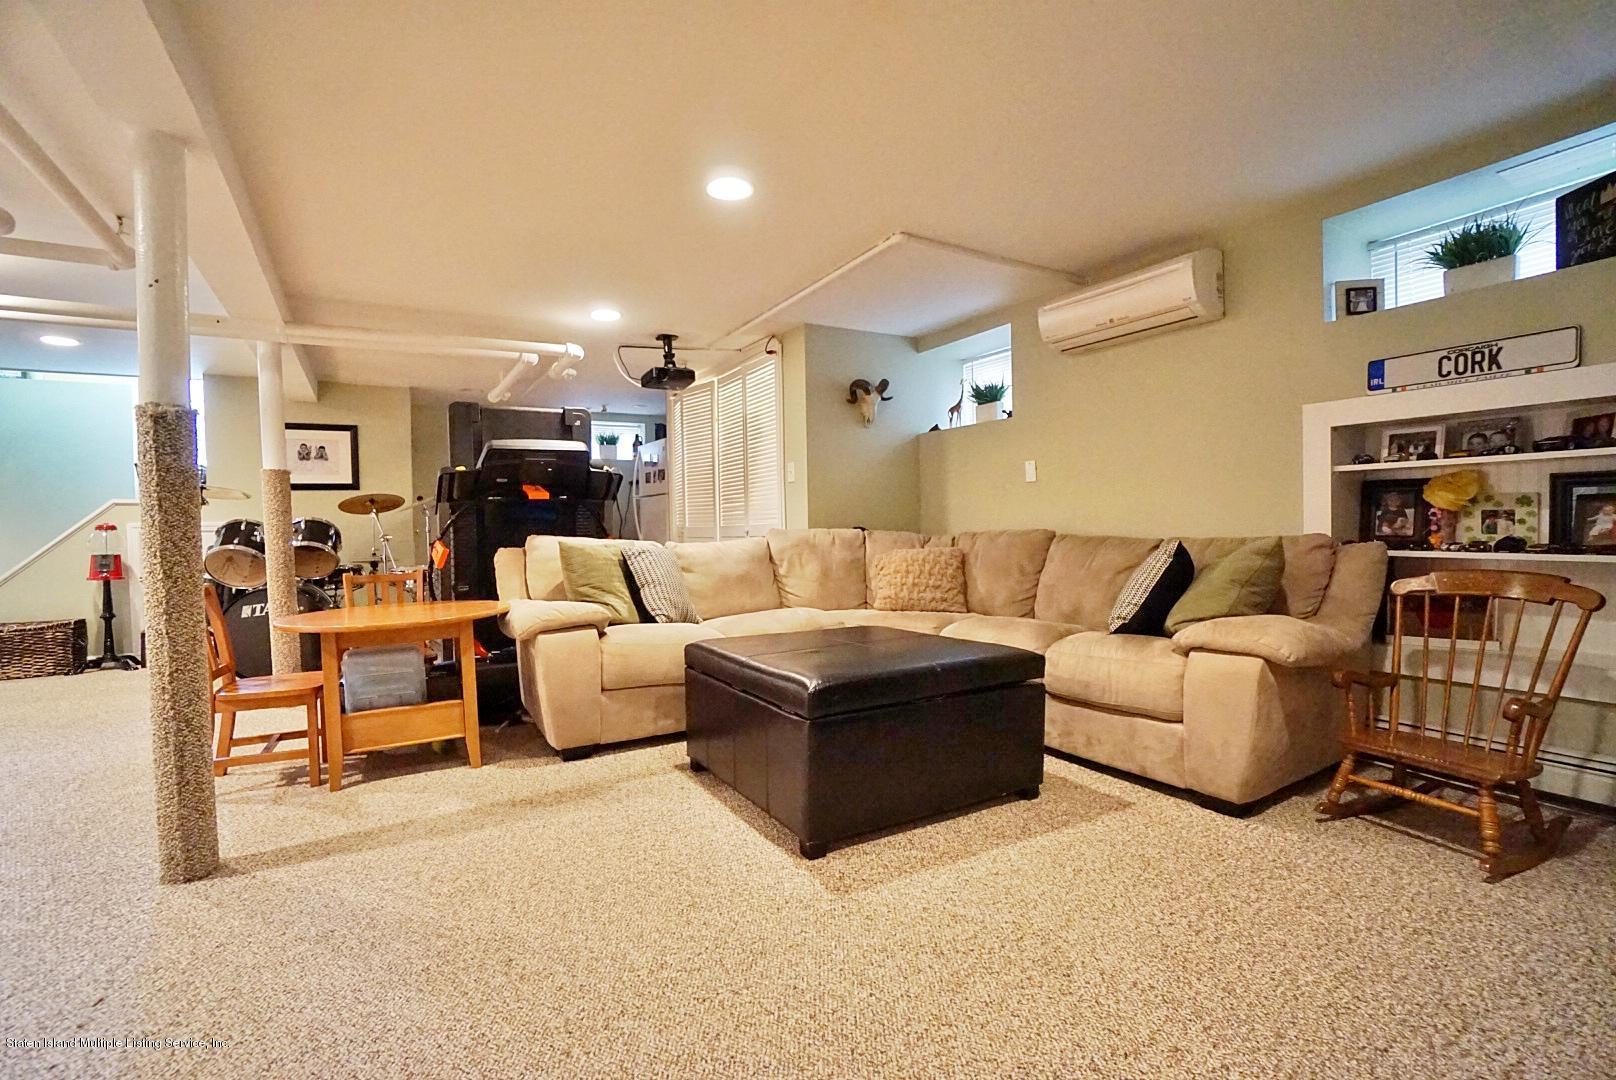 Single Family - Detached 171 Keiber Court  Staten Island, NY 10314, MLS-1127425-33